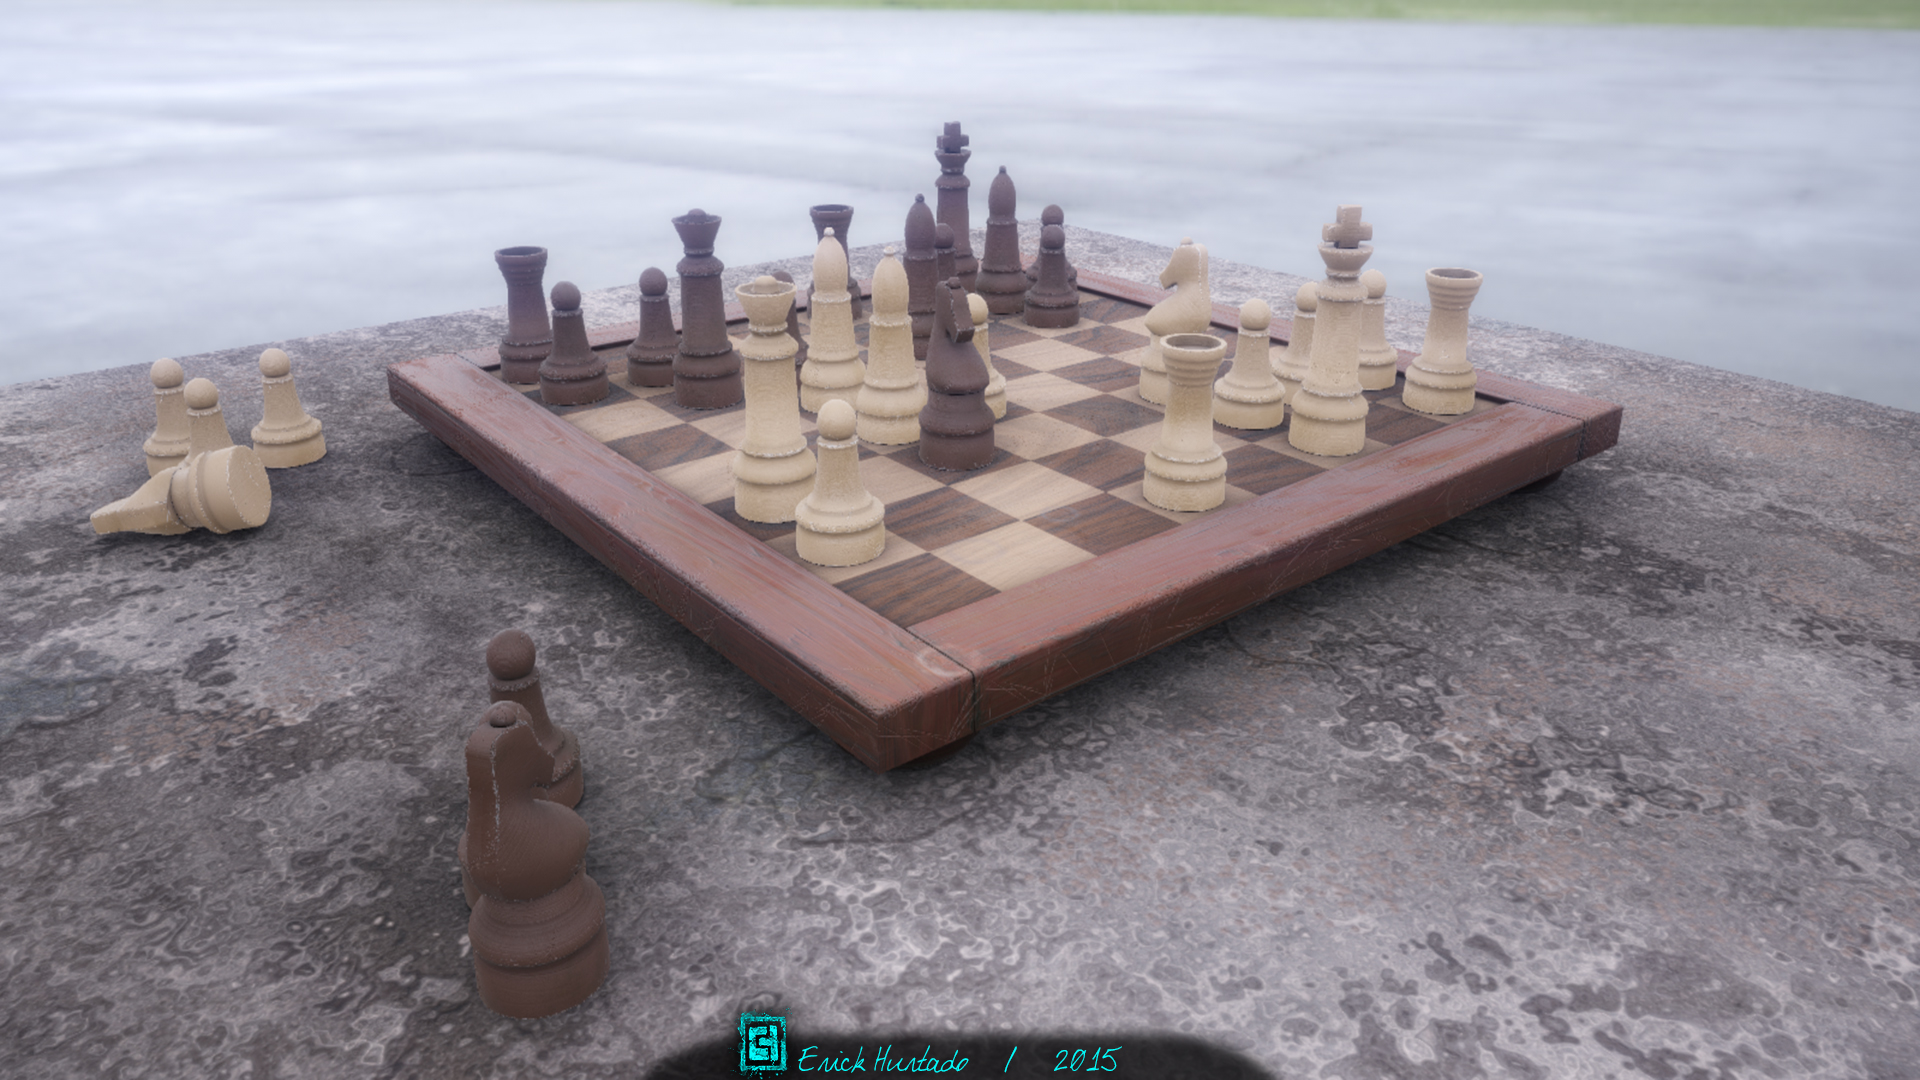 ewHurtado_Chess_01.jpg